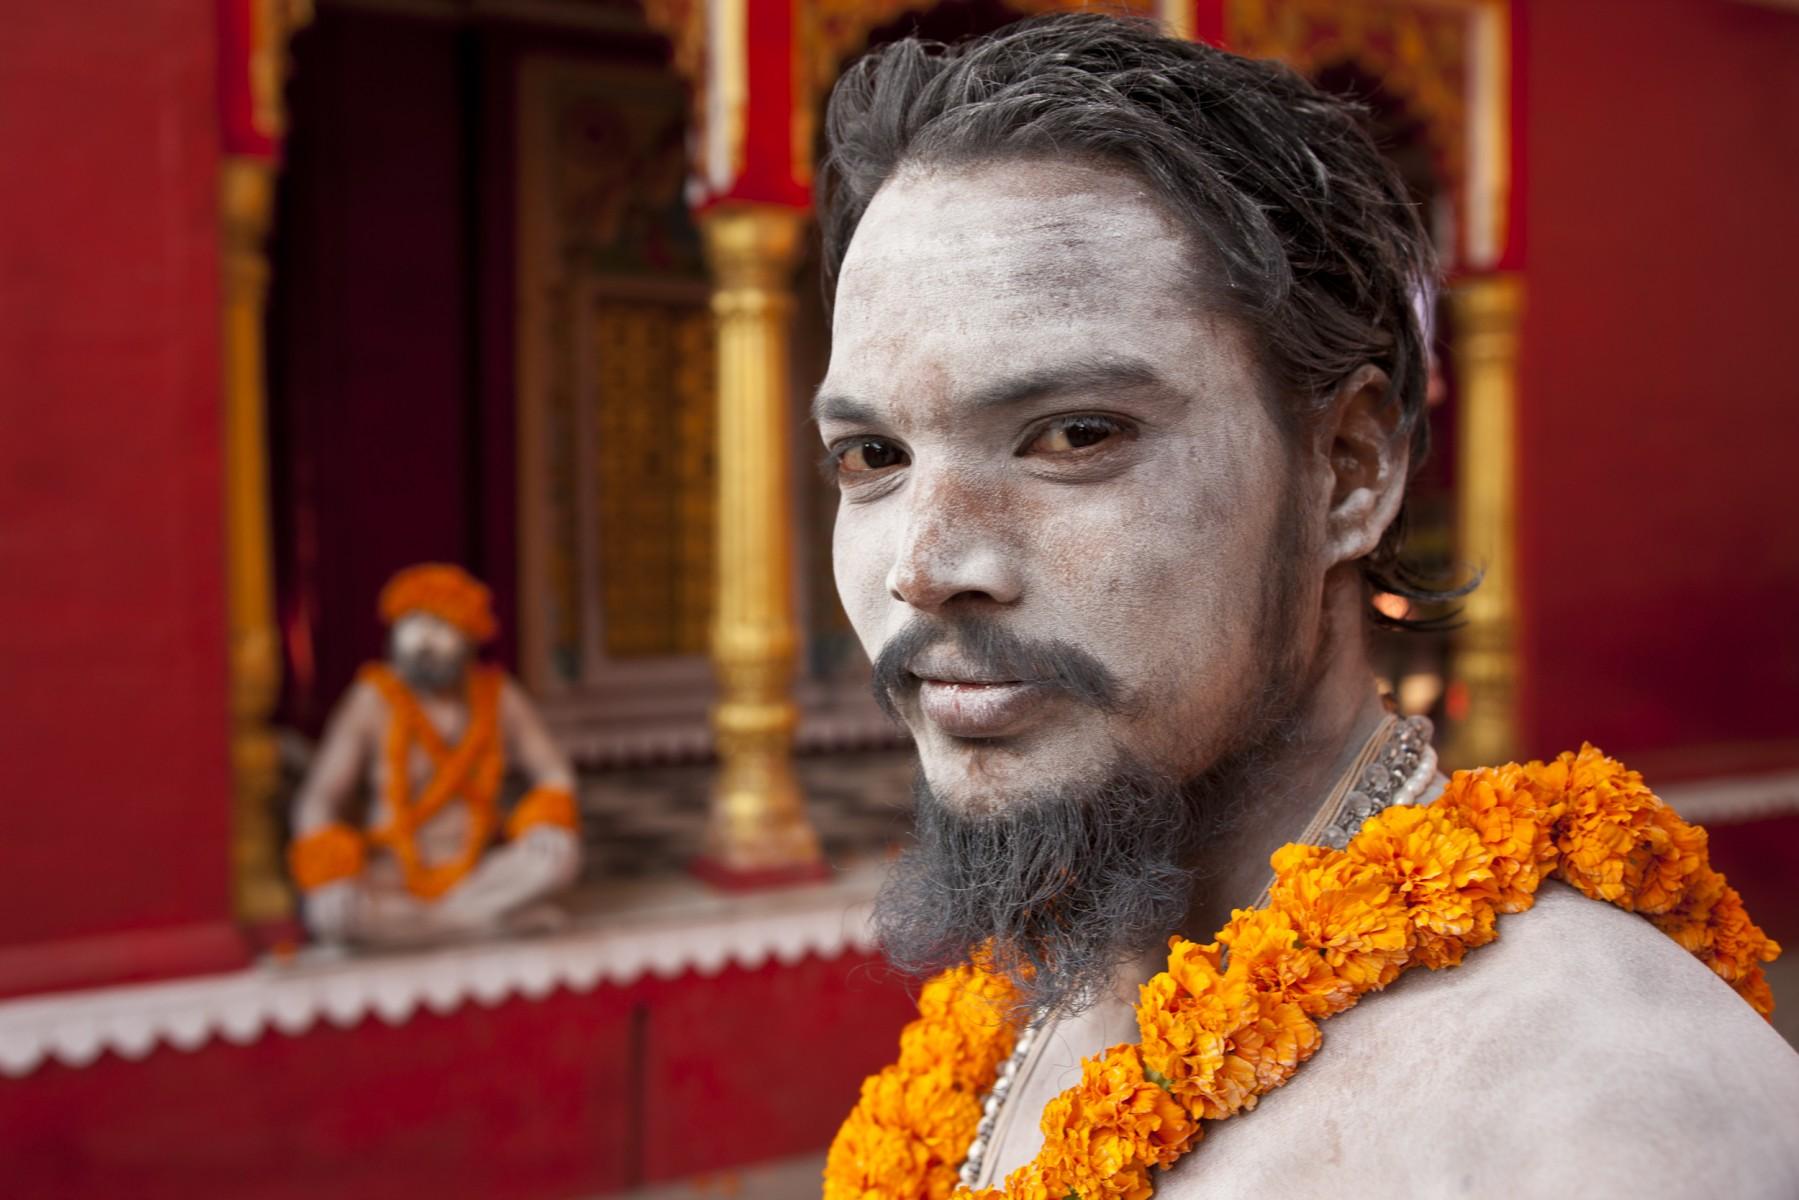 Sadhu from Niranjani Akhara portrait